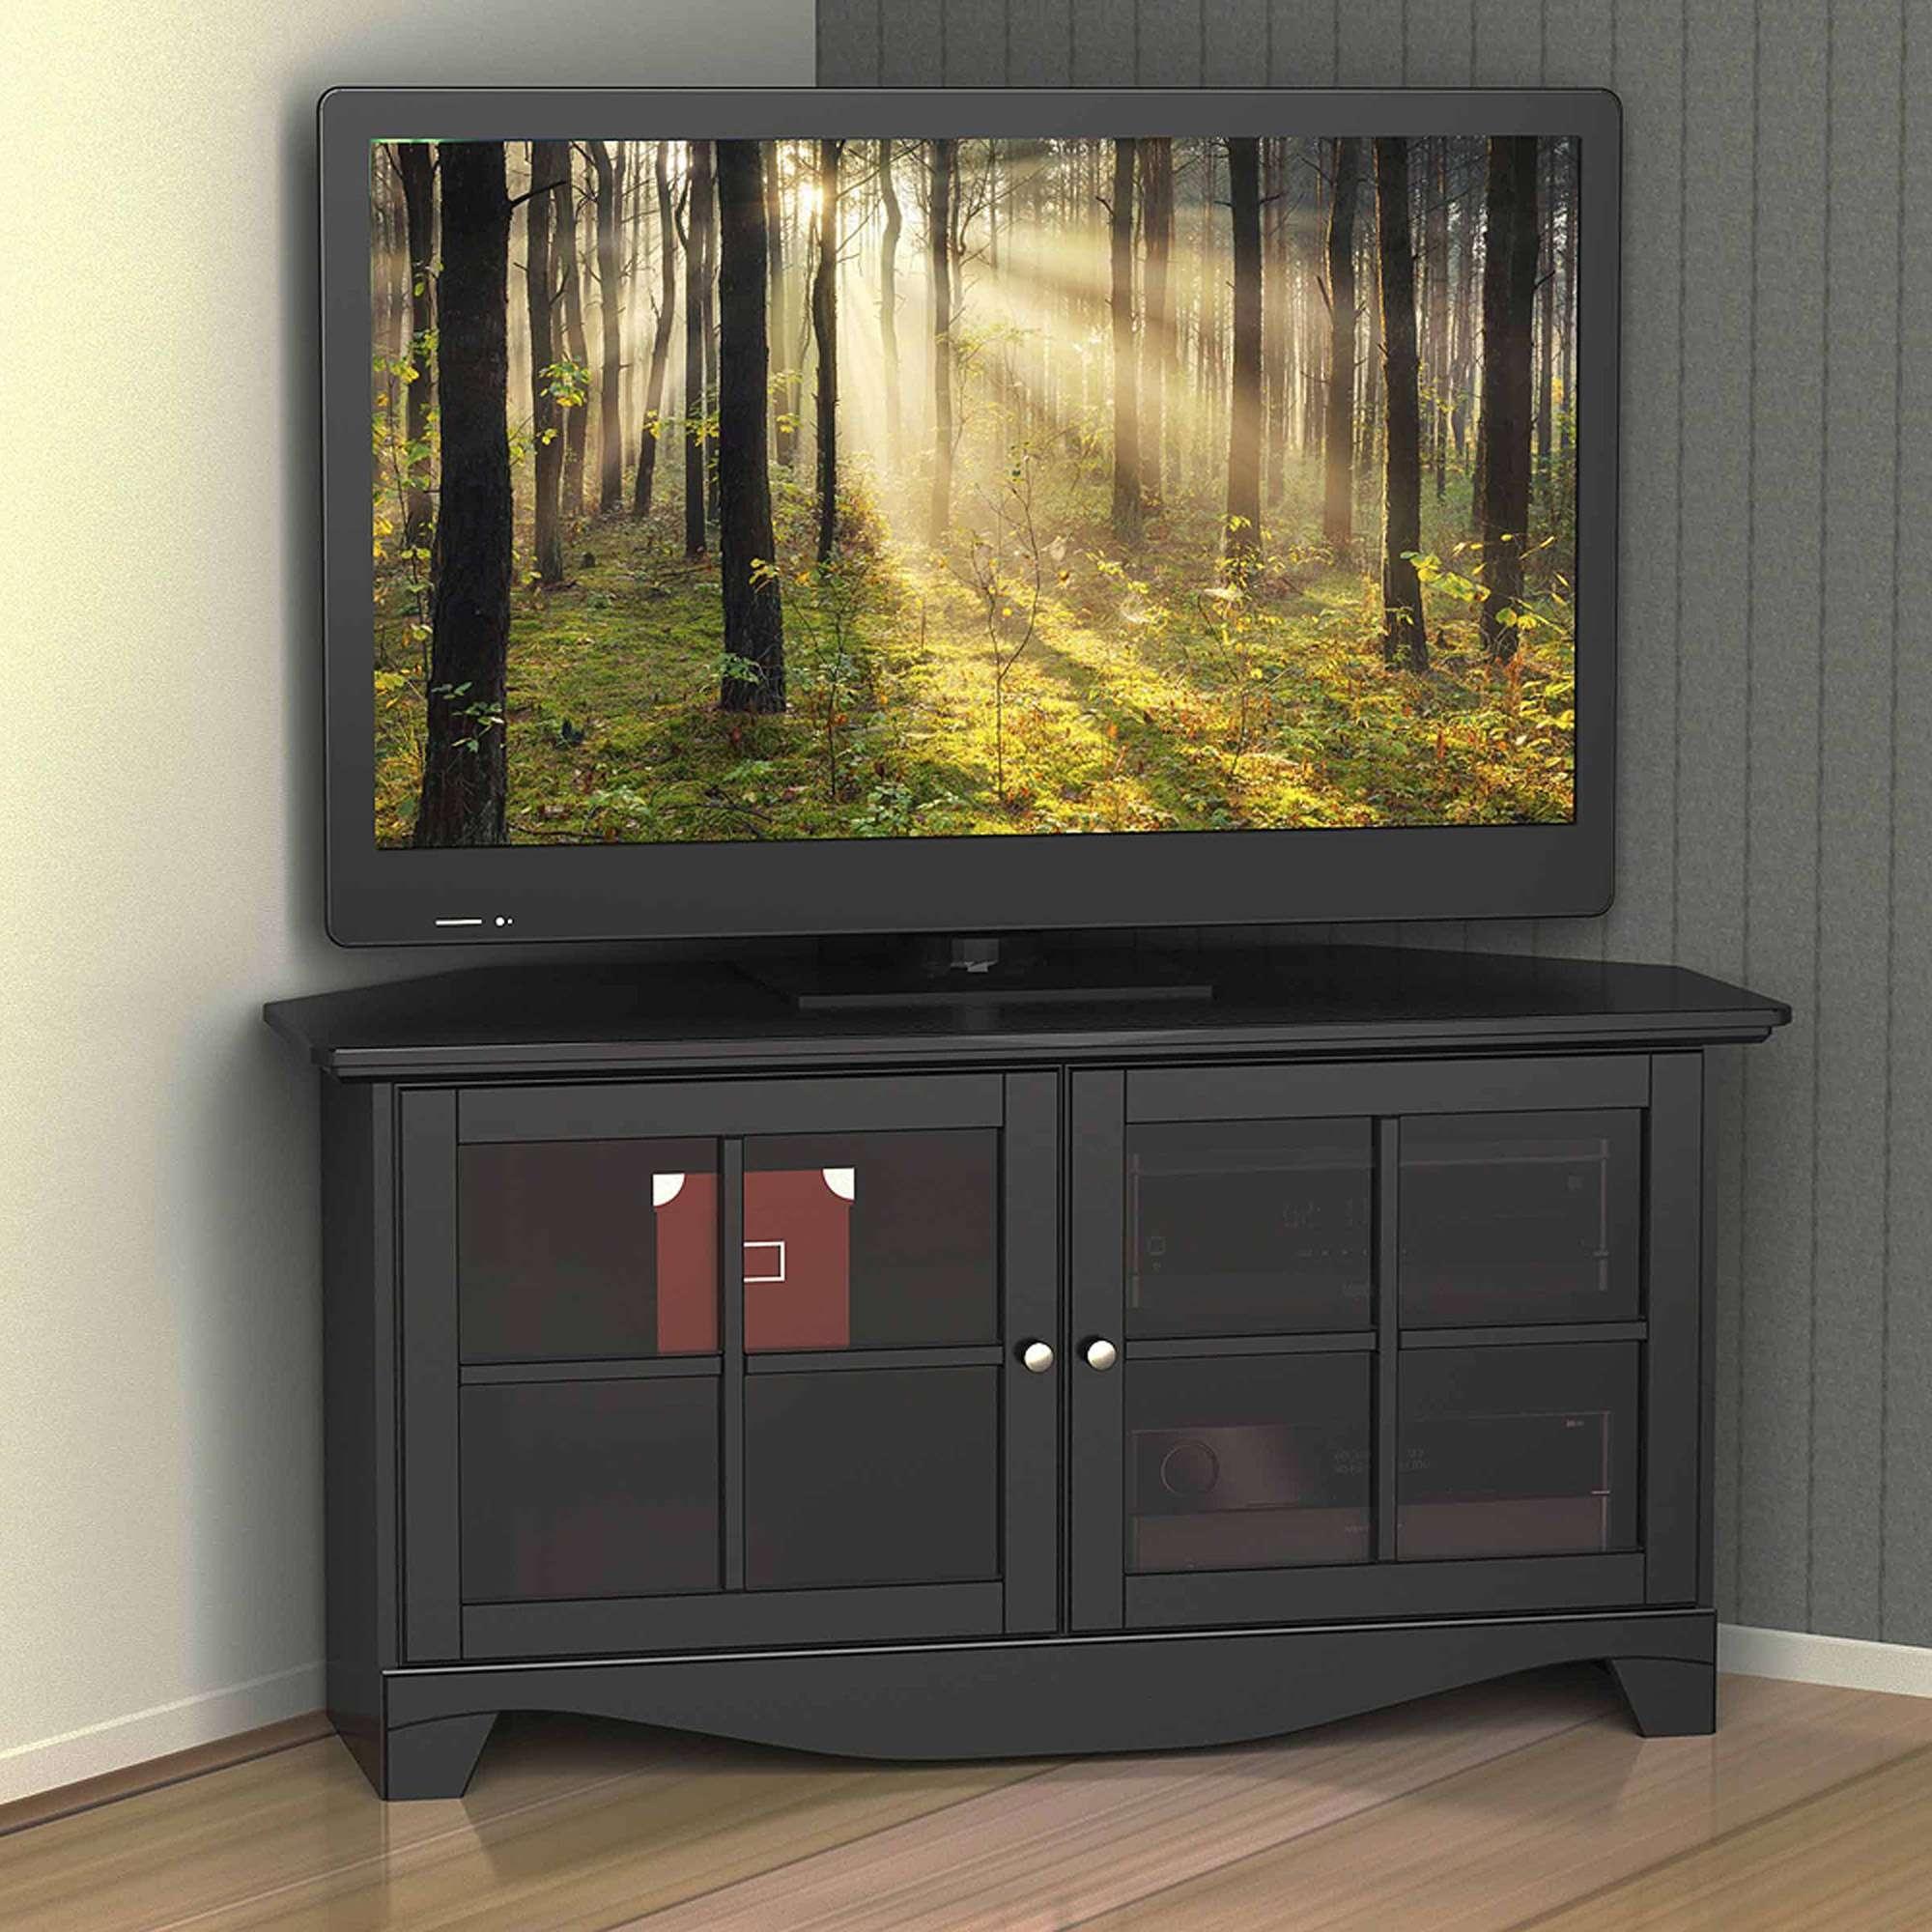 Nexera Pinnacle Black 2 Door Corner Tv Stand For Tvs Up To 49 With Regard To Black Corner Tv Cabinets (View 2 of 20)